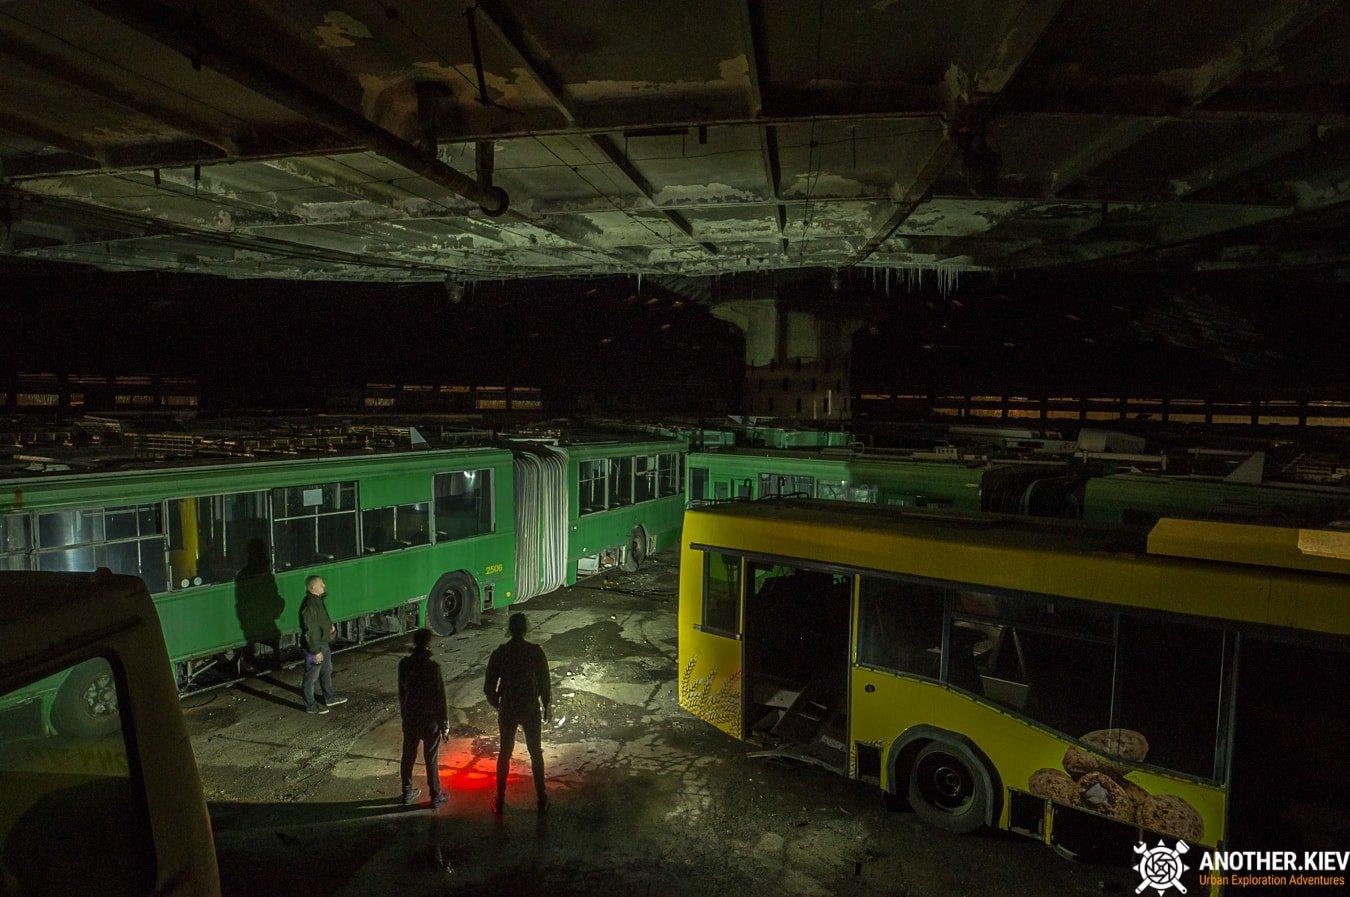 bus-graveyard-kiev-6750-min Автобусный парк №7 вночи